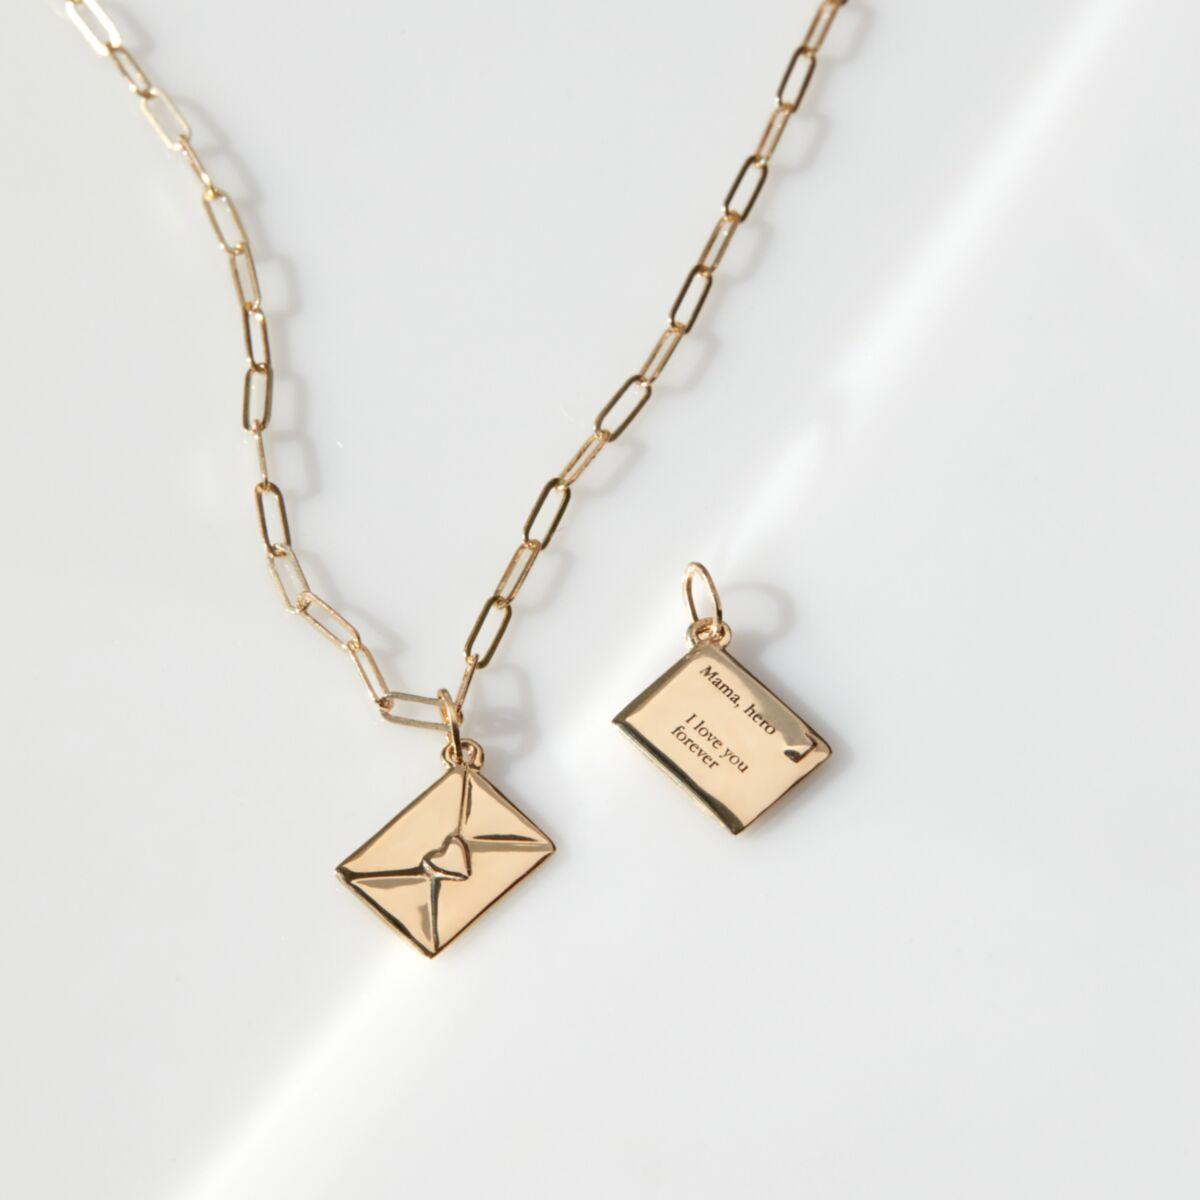 Smallest Love Letter Charm image